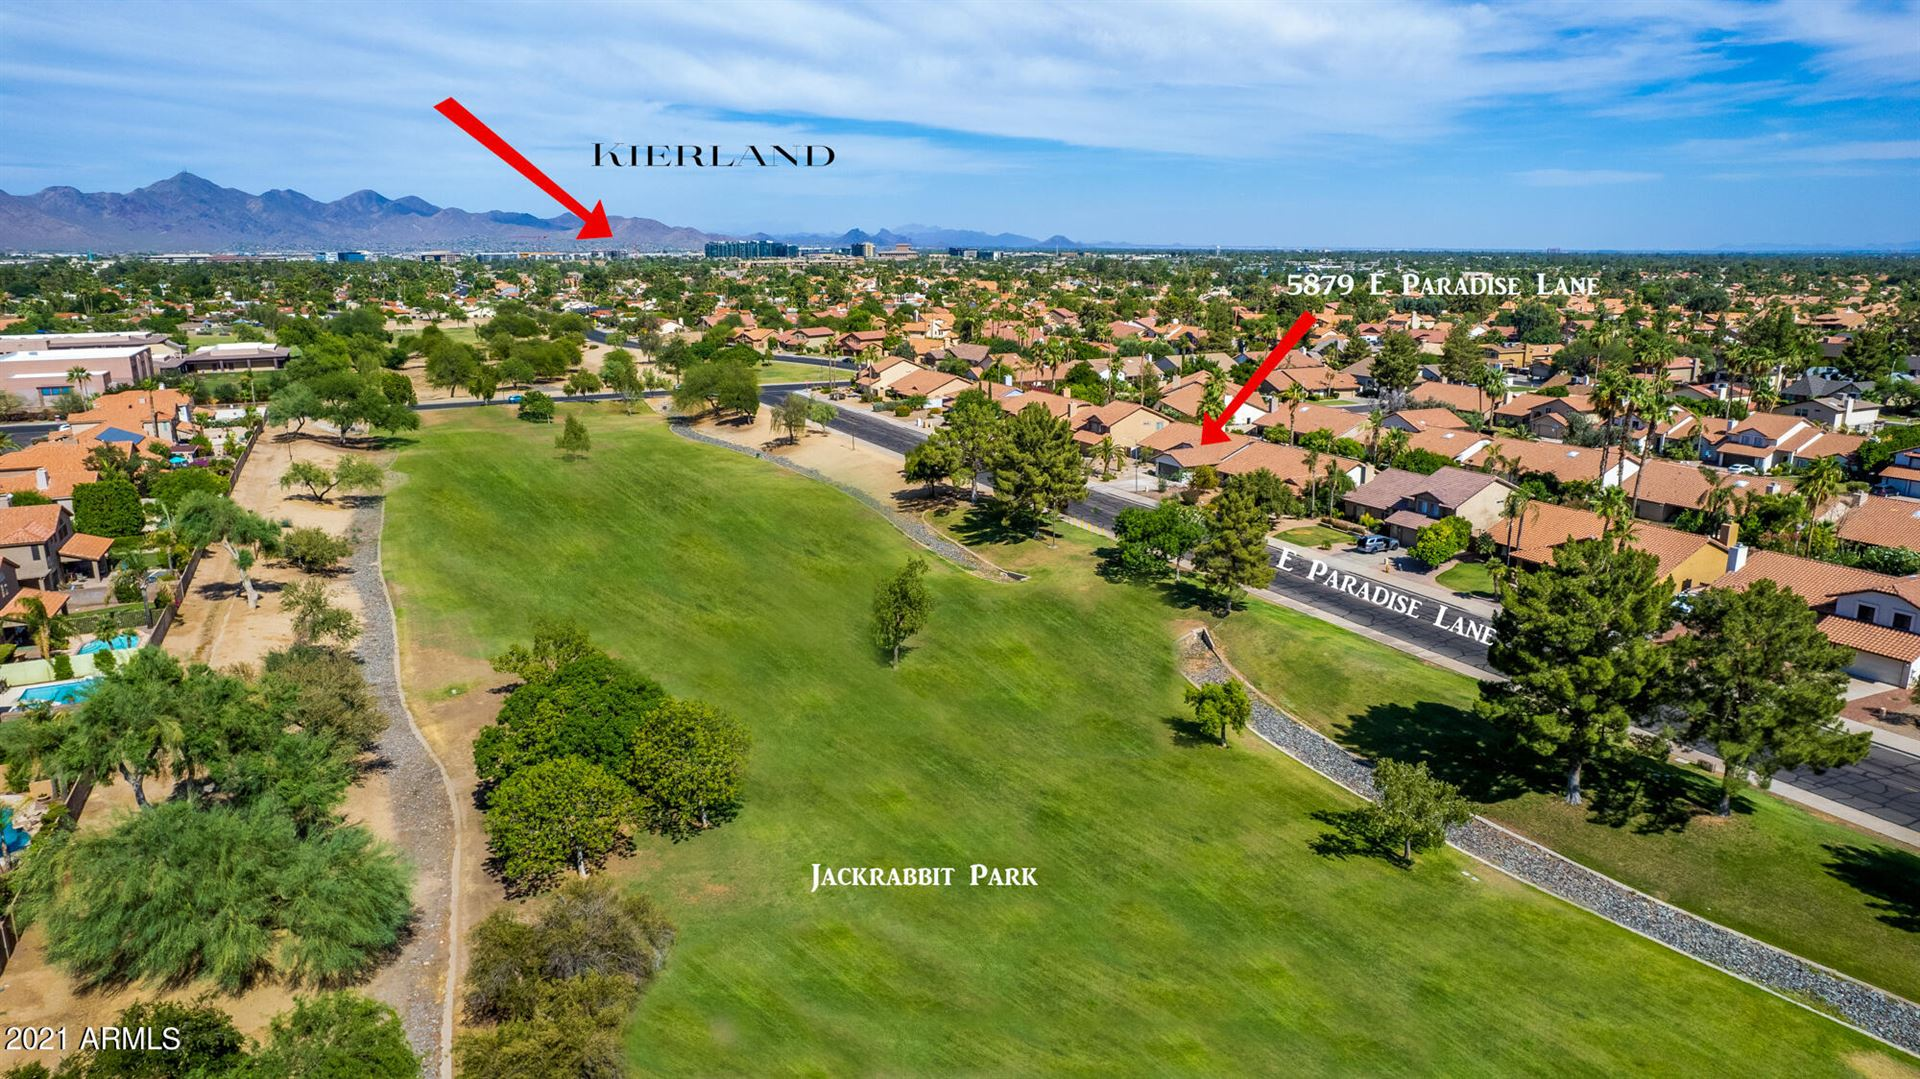 Photo of 5879 E Paradise Lane, Scottsdale, AZ 85254 (MLS # 6245908)